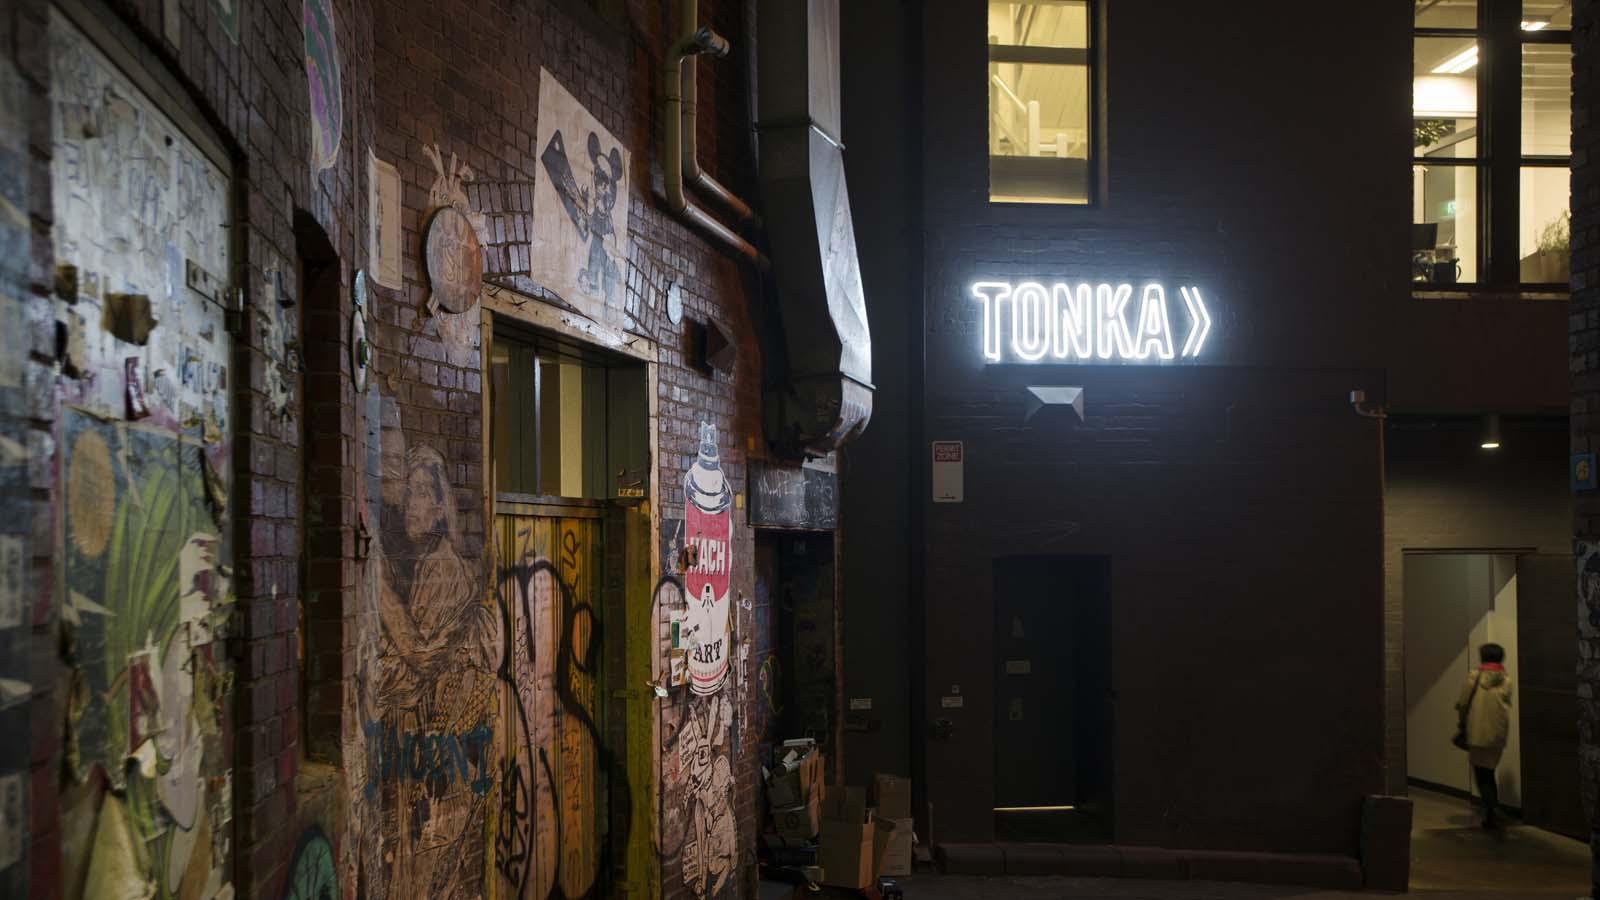 Tonka, Melbourne, Victoria, Australia